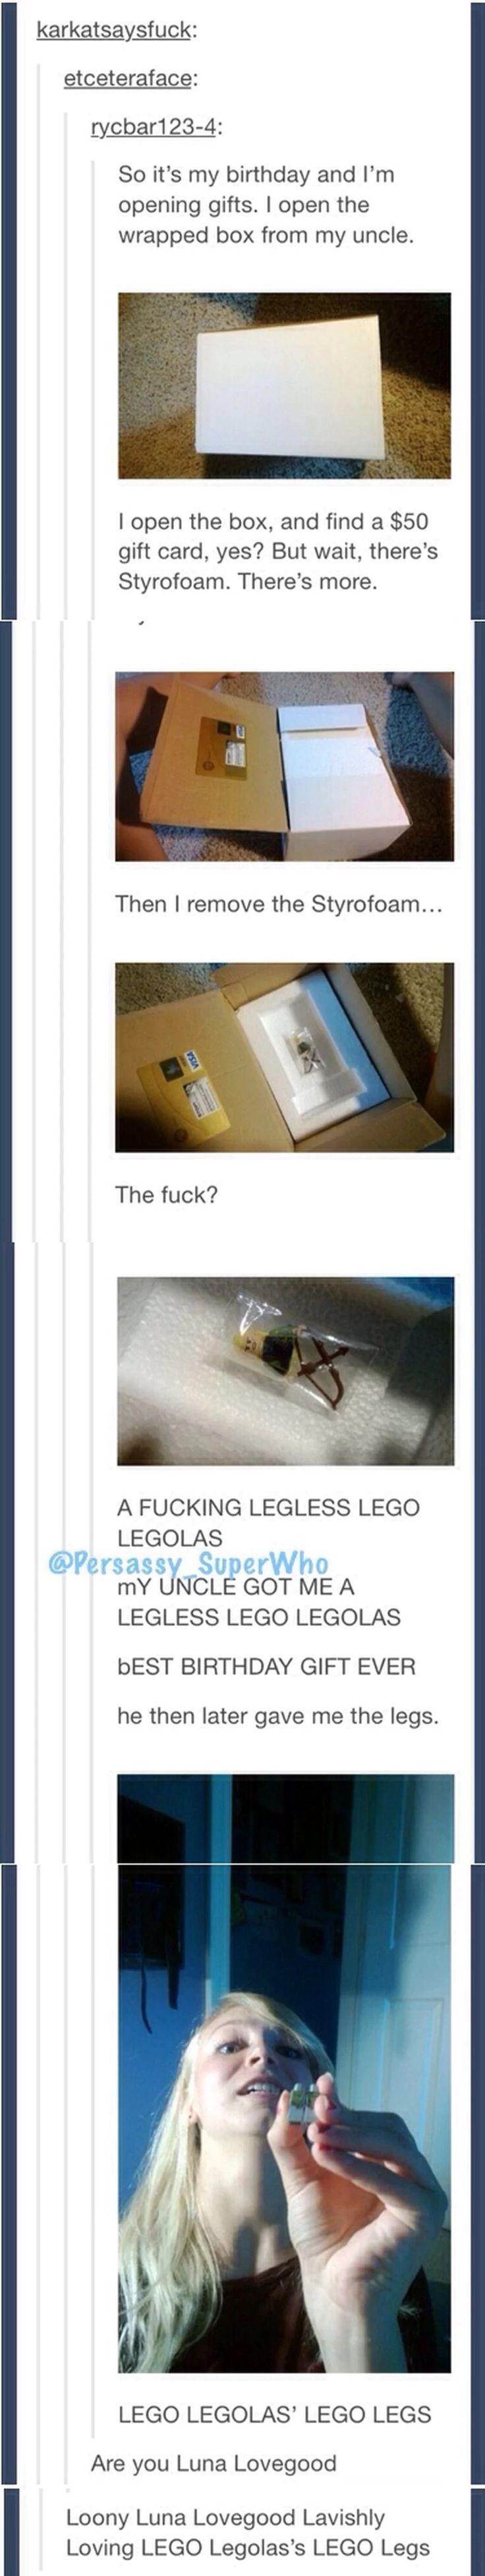 Loony Luna Lovegood Lavishly Loving LEGO Legolas's LEGO Legs. Me encanto!